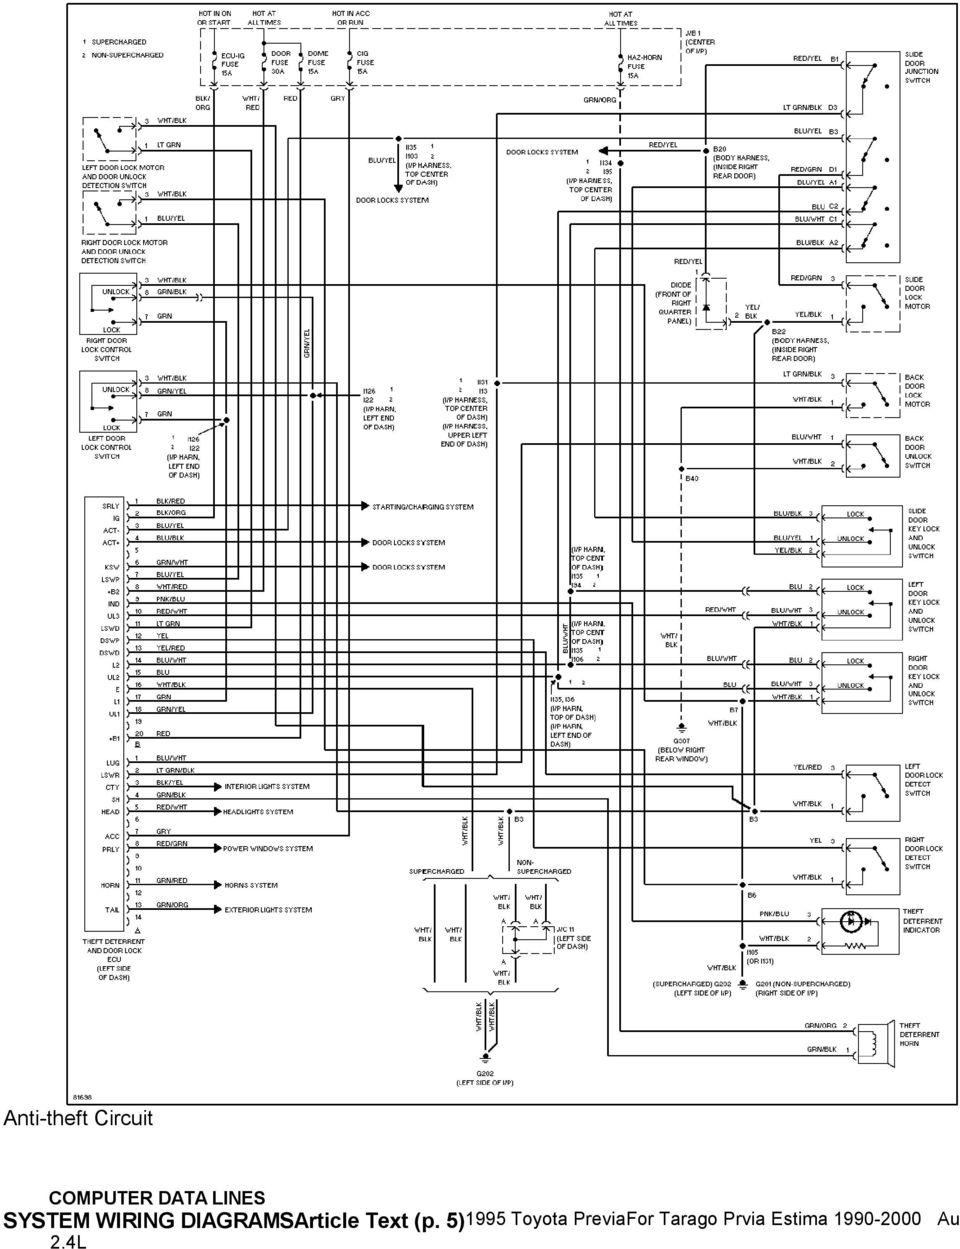 hight resolution of toyota lucida wiring diagram electrical wiring diagrams toyota fuel pump relay location toyota estima fuse box